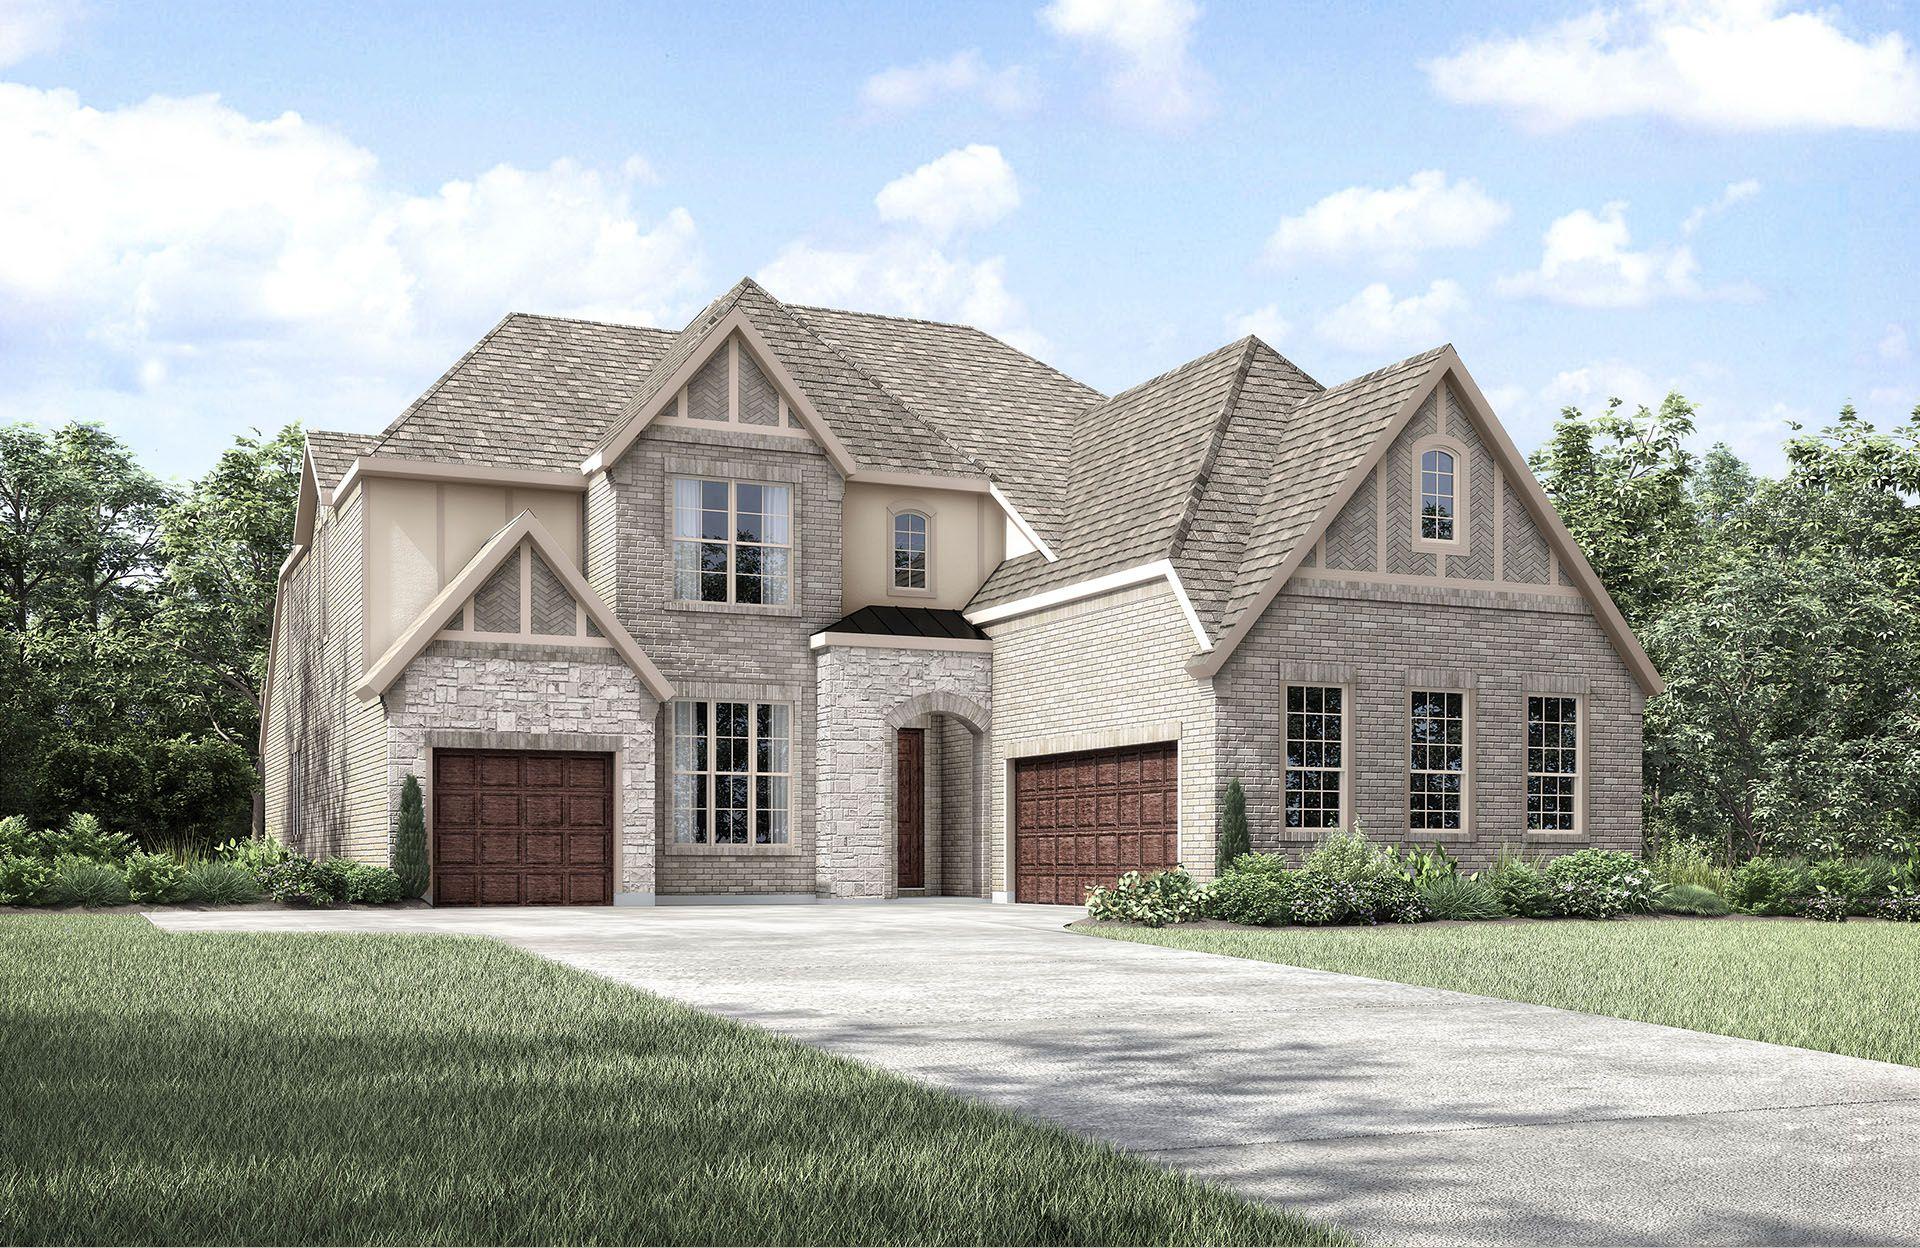 Single Family for Sale at Union Park - Grayford 4908 Union Park Boulevard East Aubrey, Texas 76227 United States